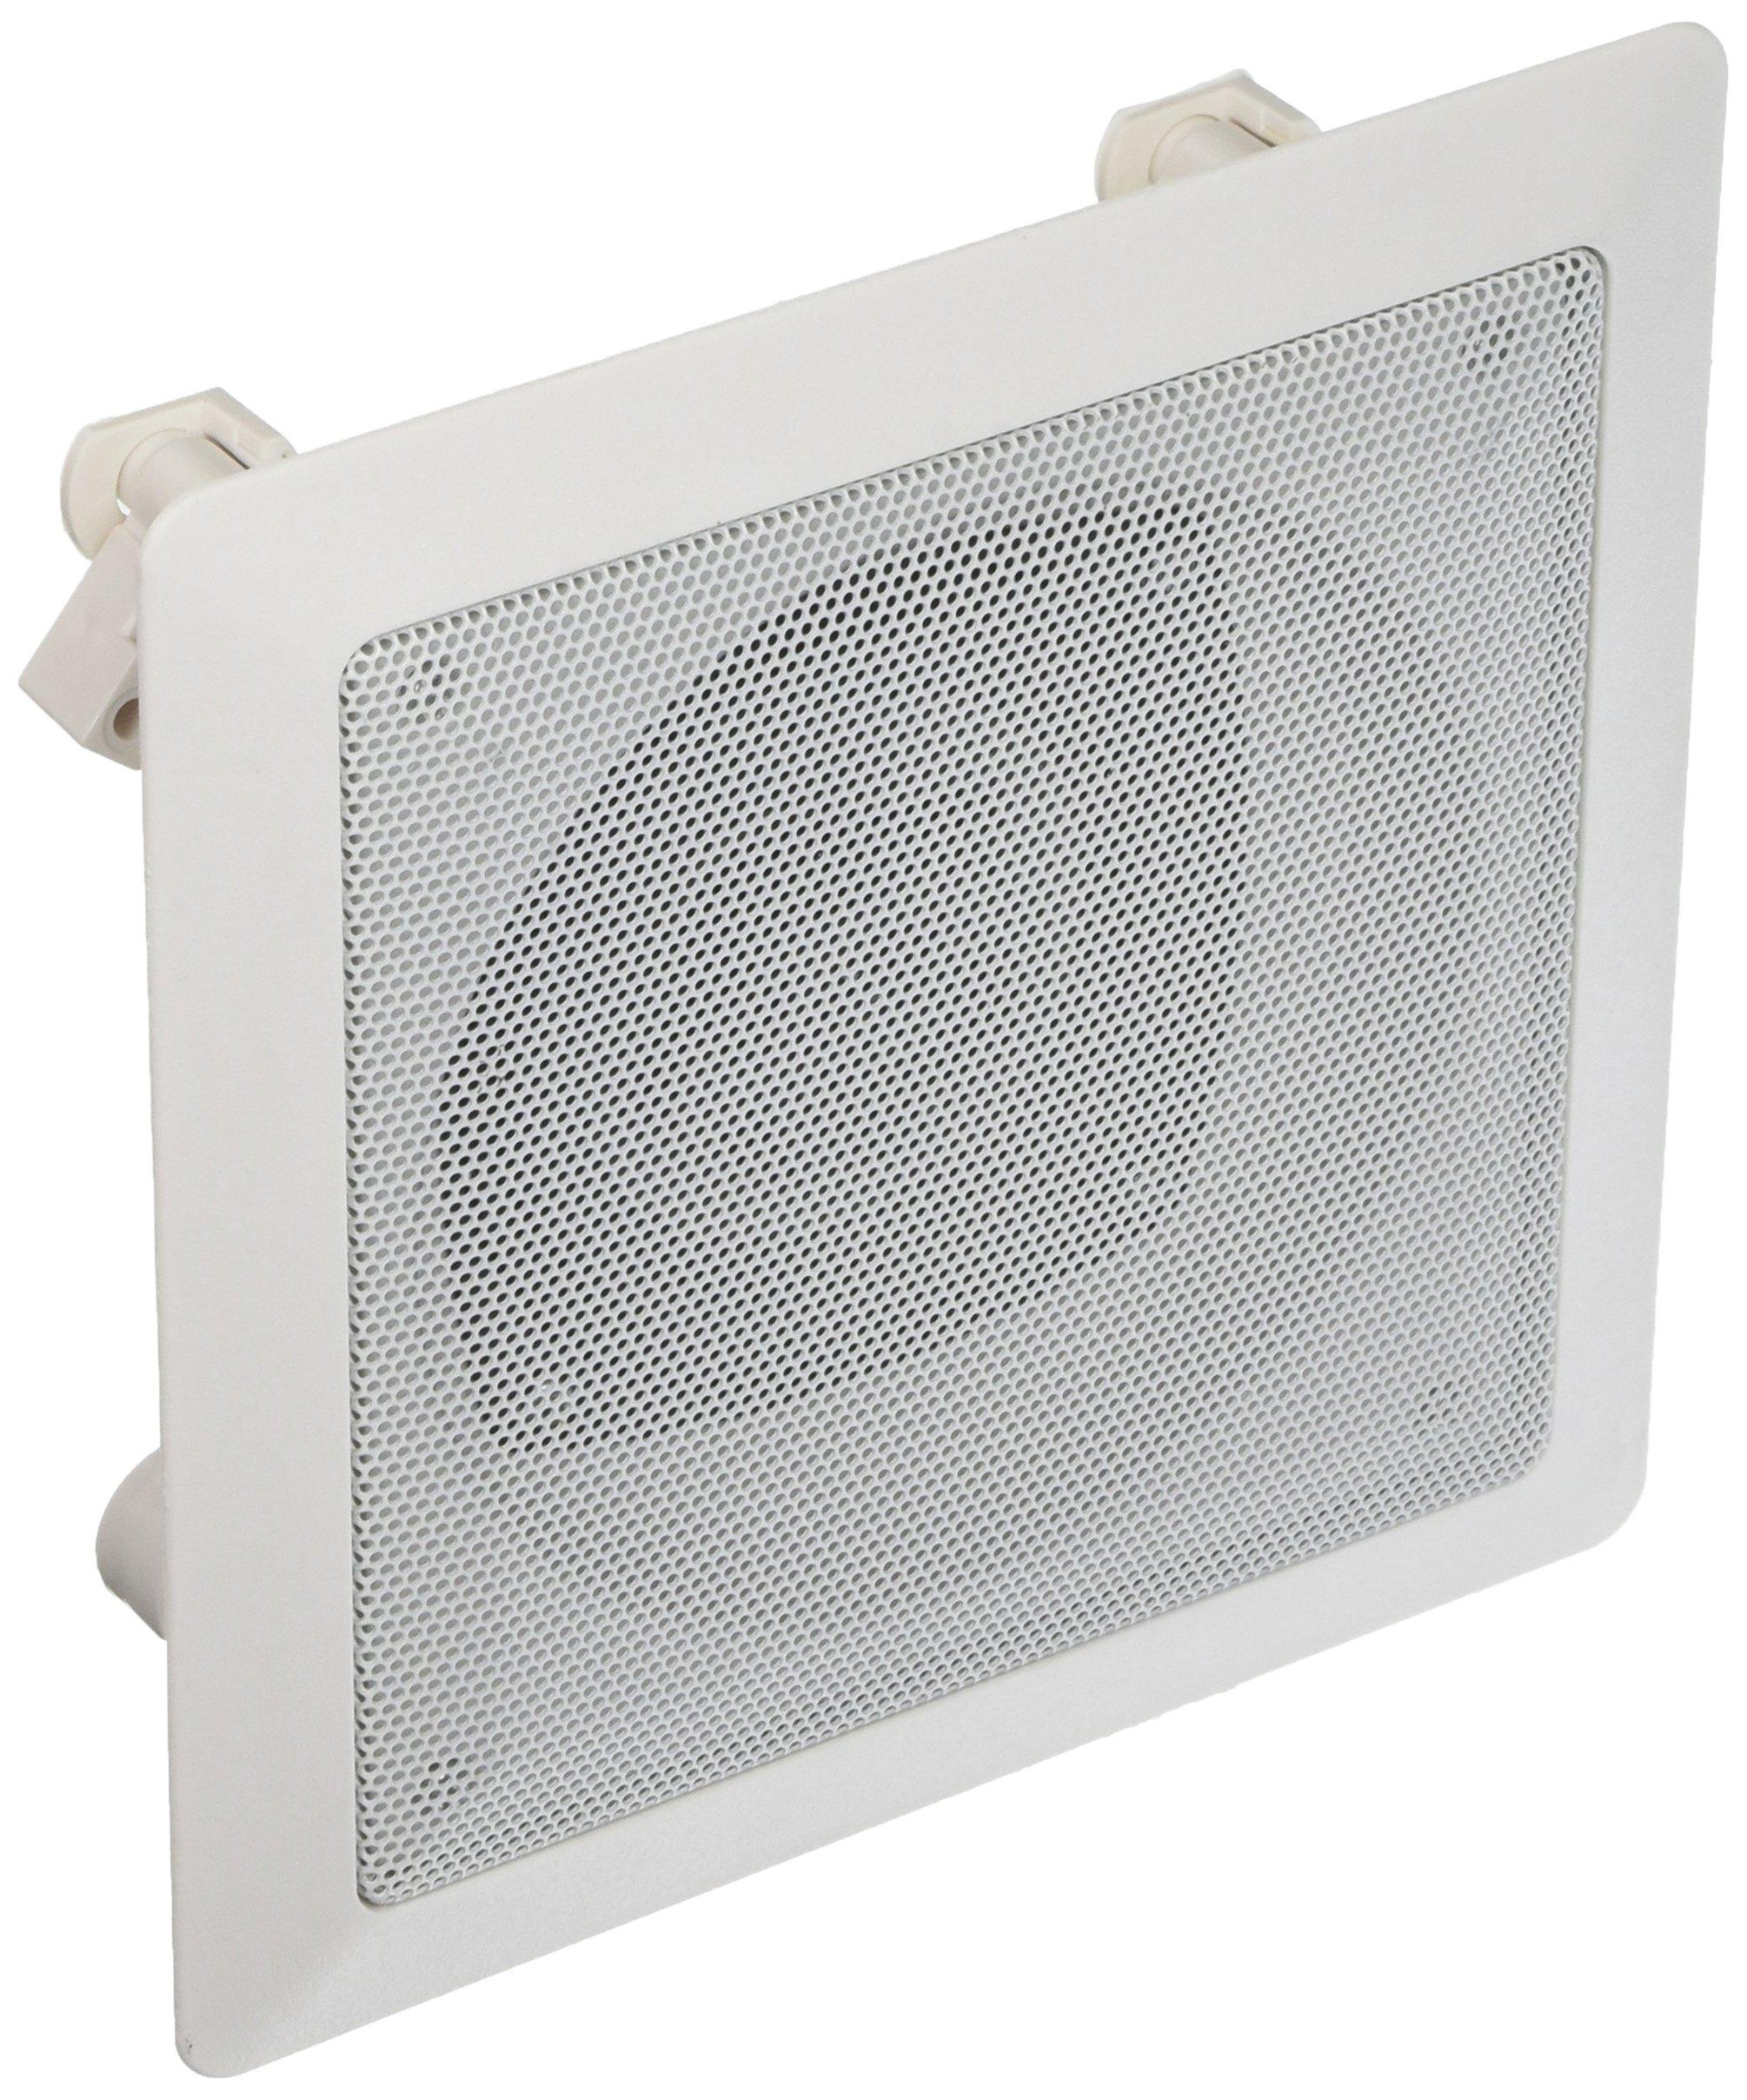 Acoustic Audio CS-i42S In Ceiling Square 2-Way Speaker (White)